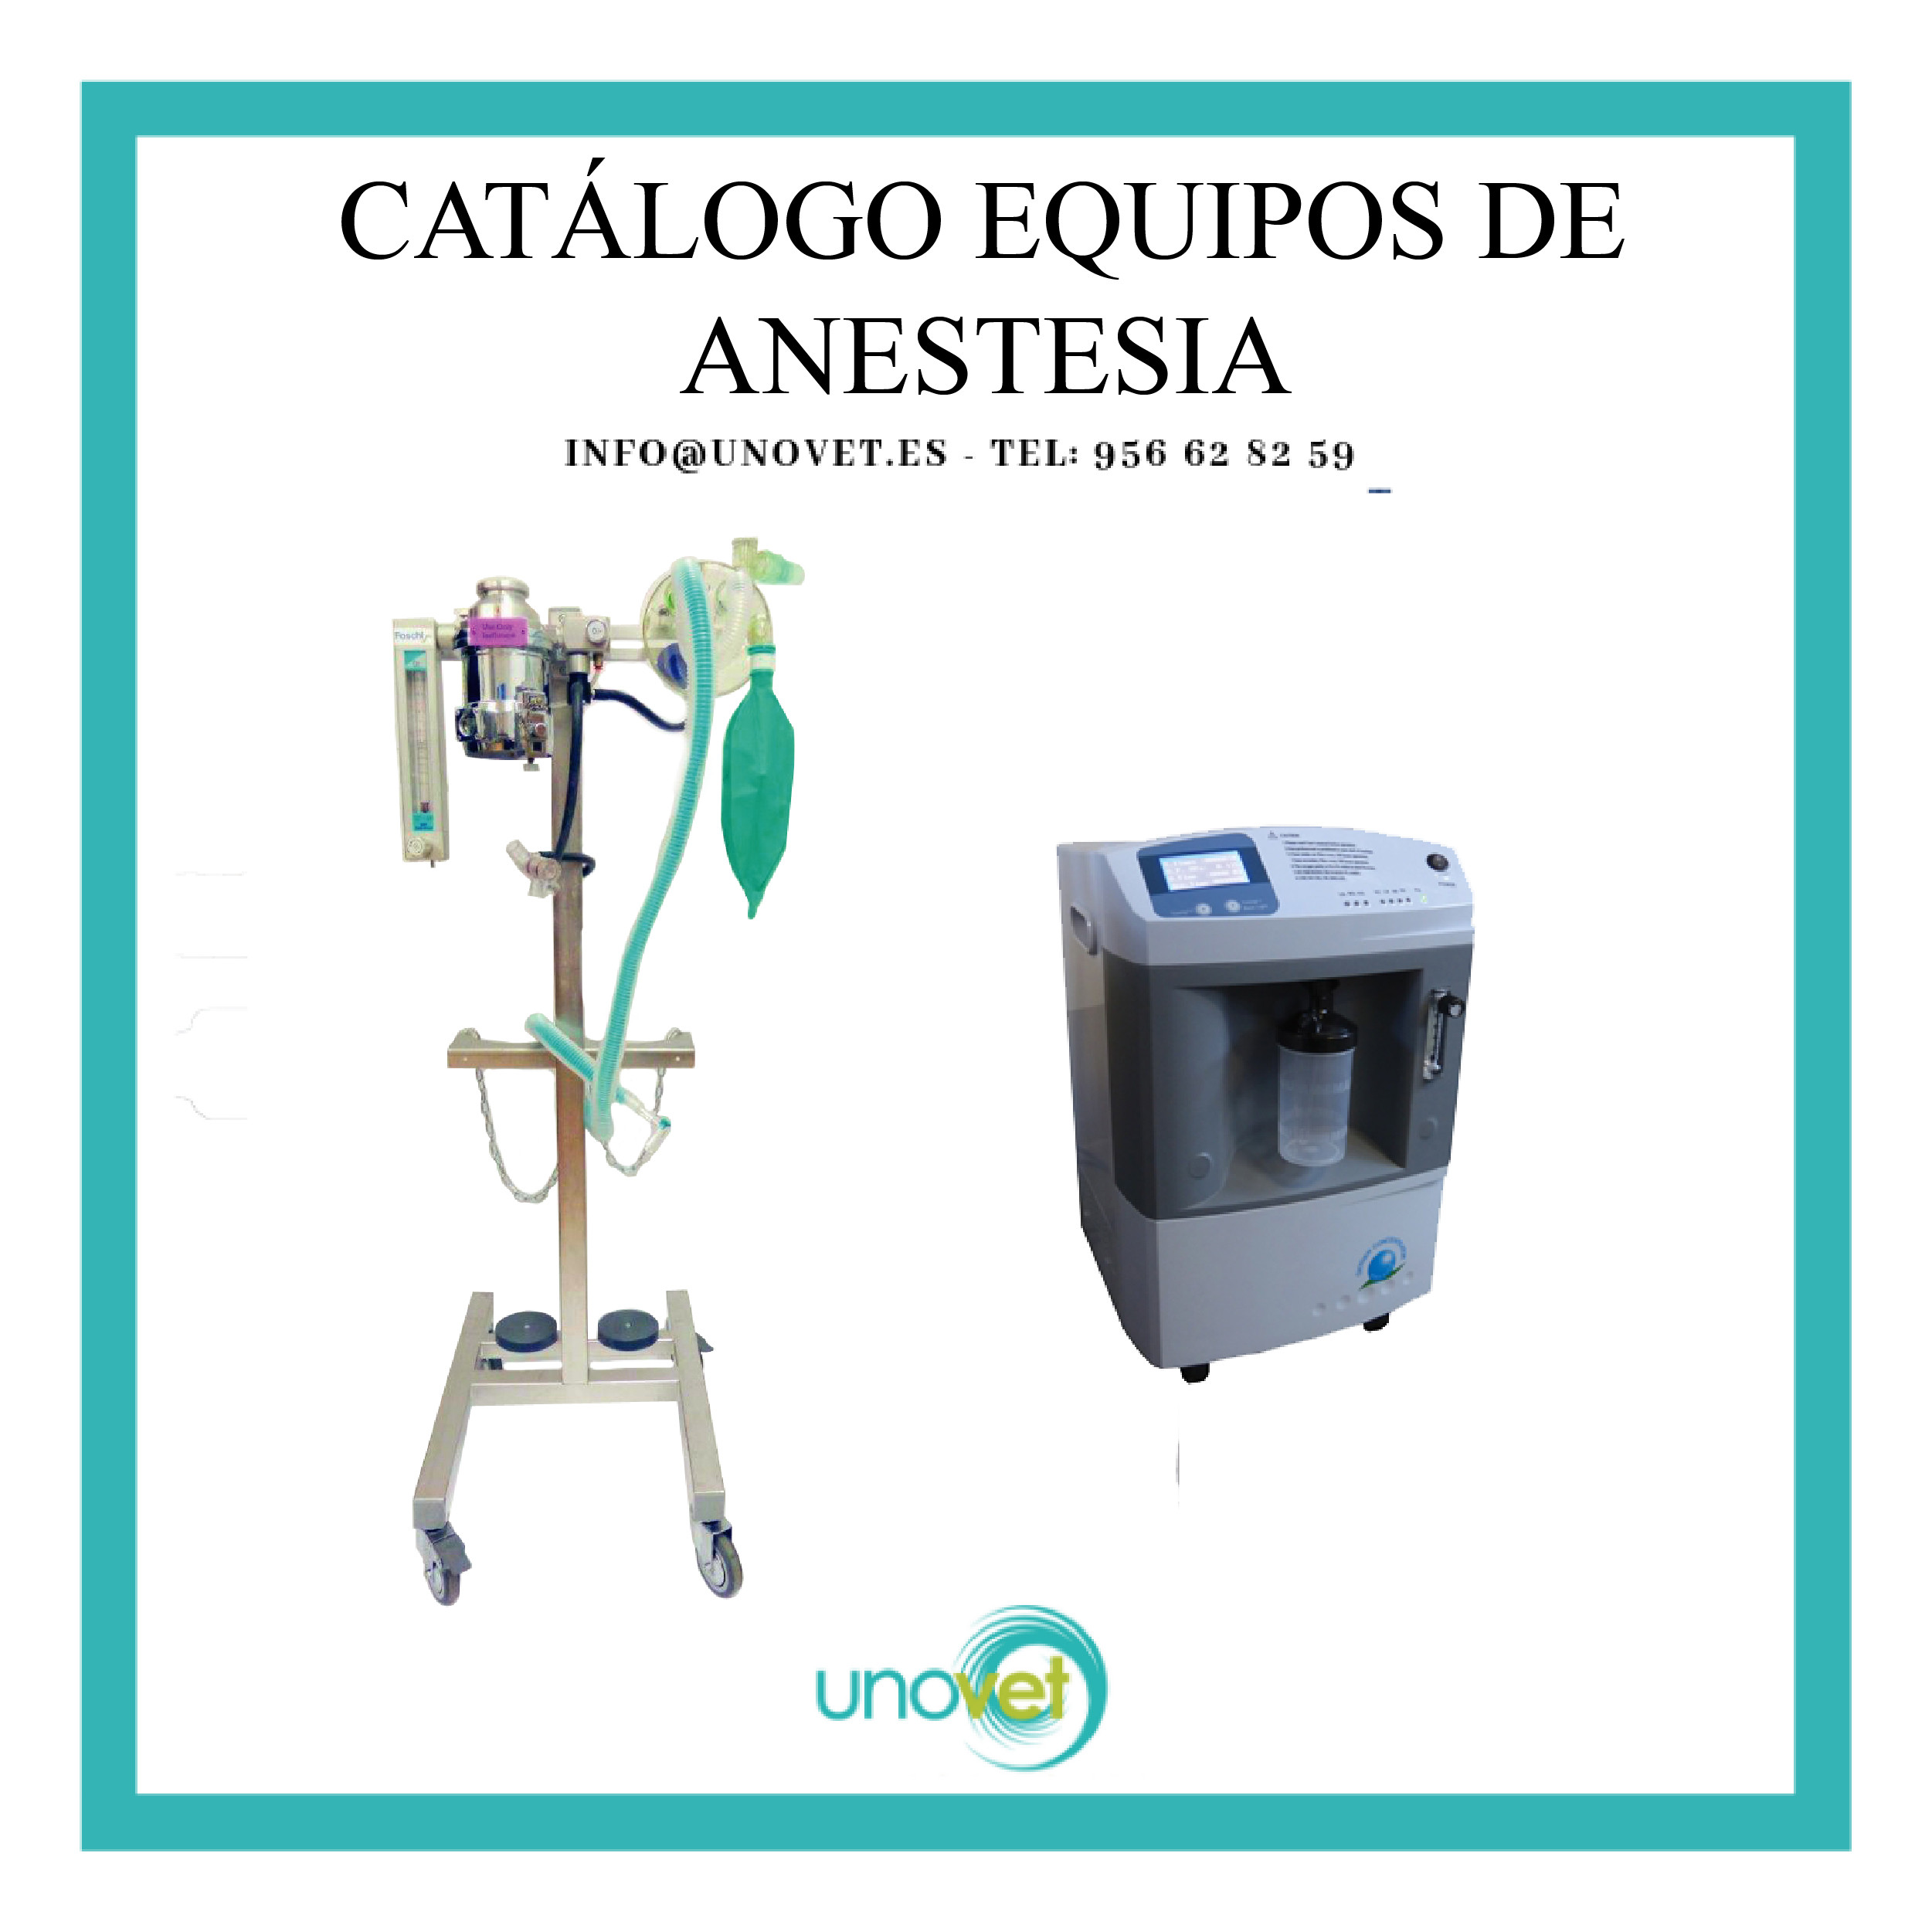 Catálogo equipos de anestesia